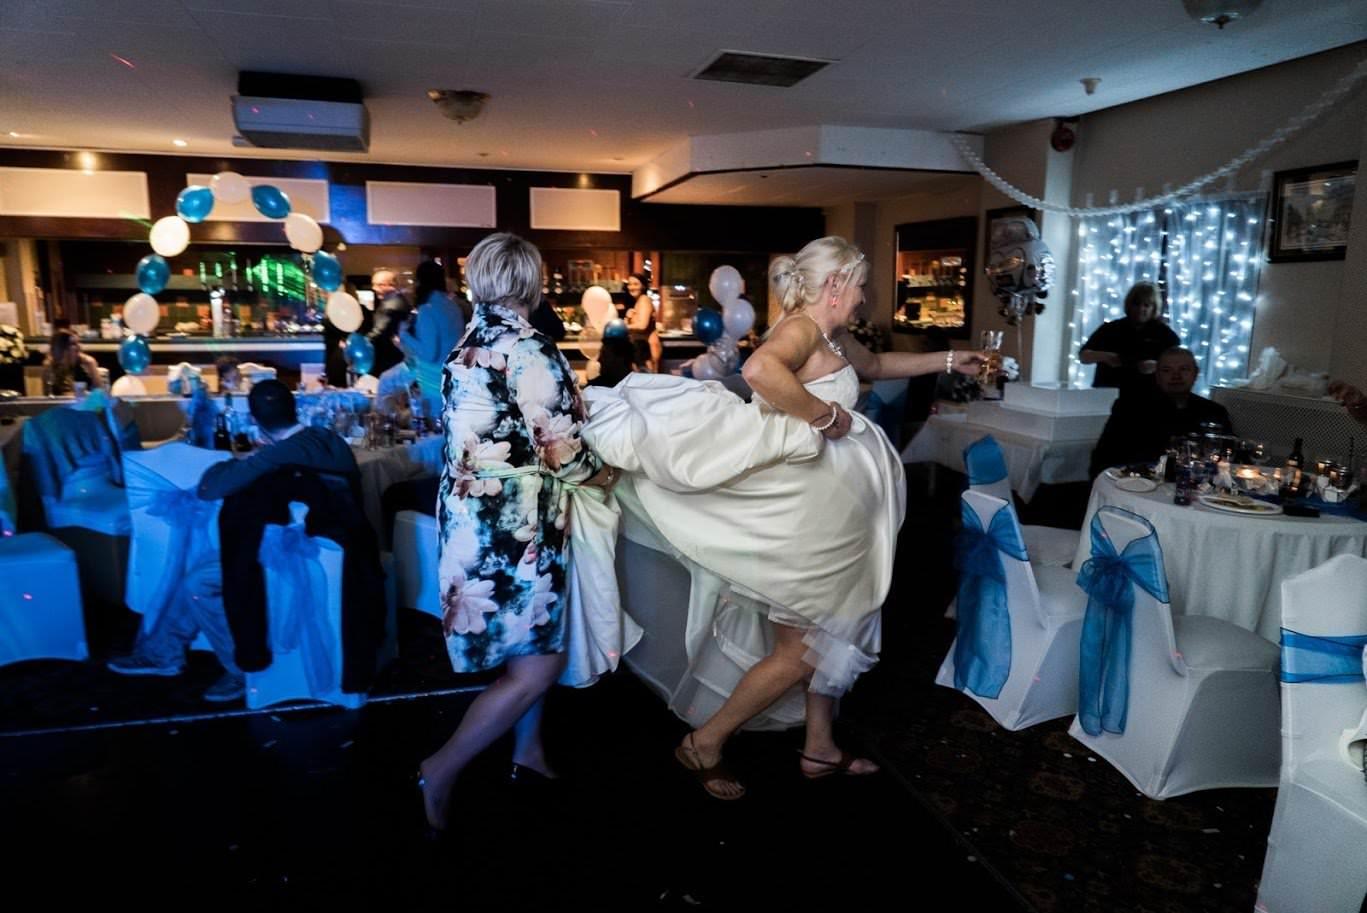 MarkHeather 203042 - Solihull Registry Office Wedding - Mark & Heather